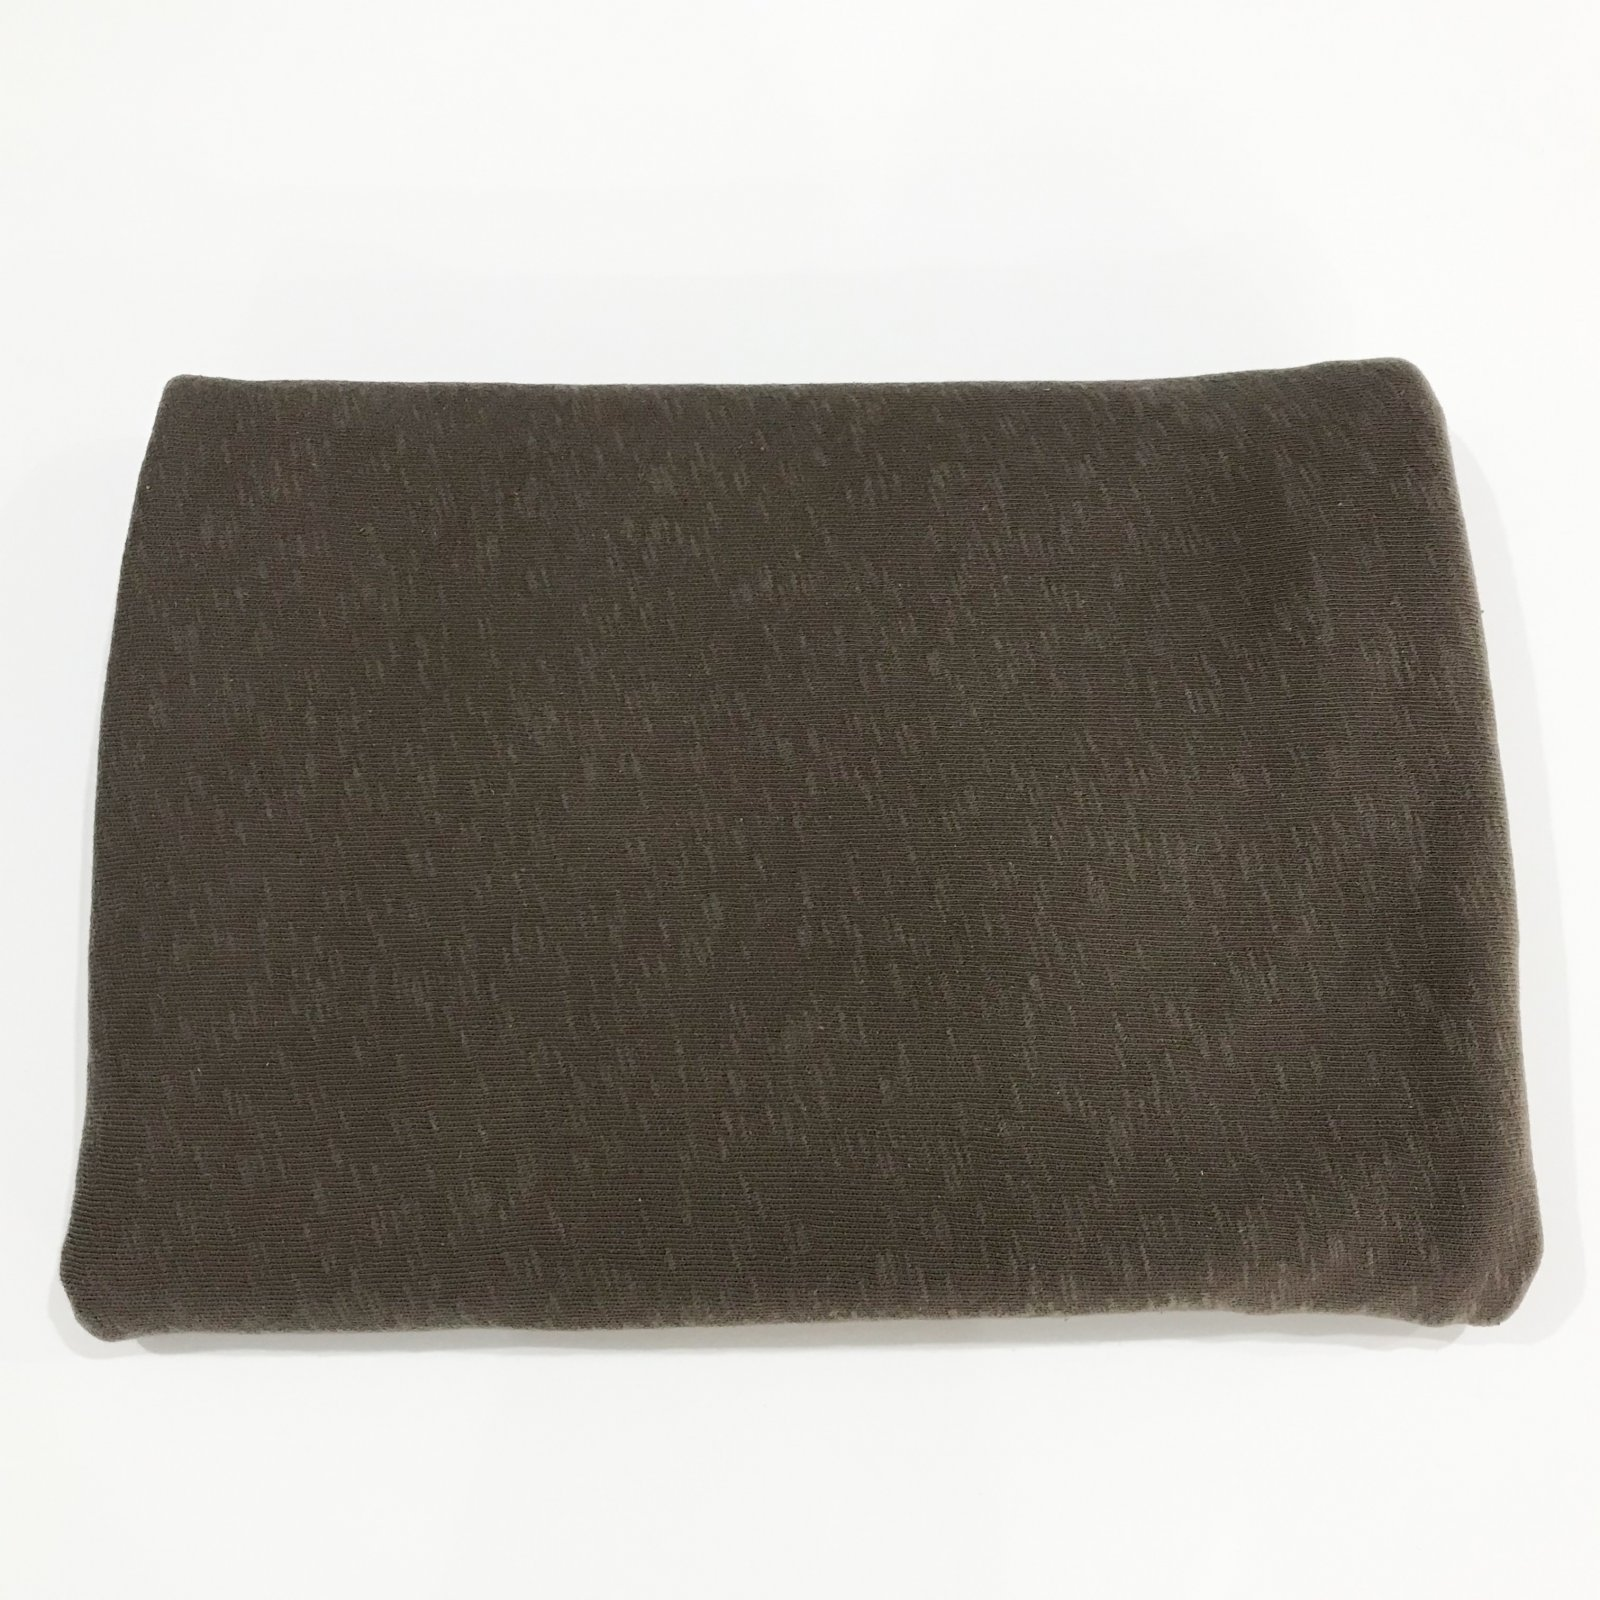 2 1/2 yards - Cotton Slub Sweater Knit - Milk Chocolate